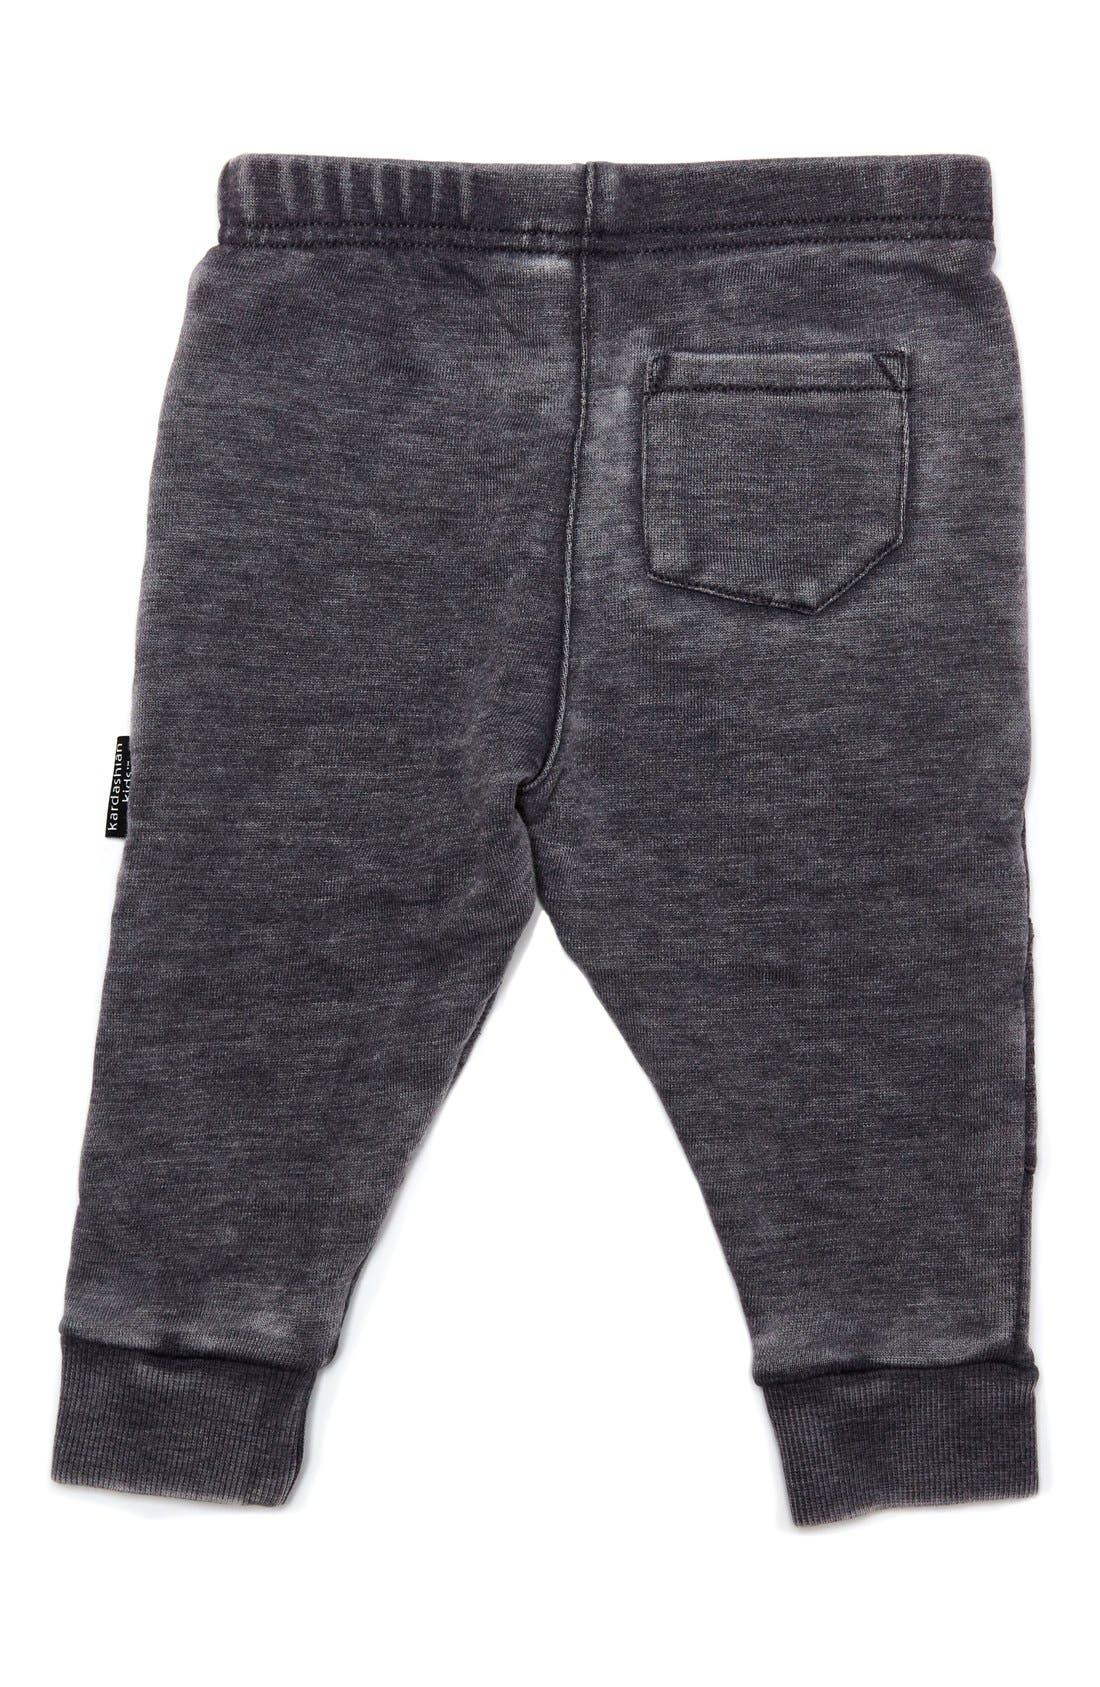 Alternate Image 2  - Kardashian Kids Quilted Jogger Pants (Toddler Boys & Little Boys)